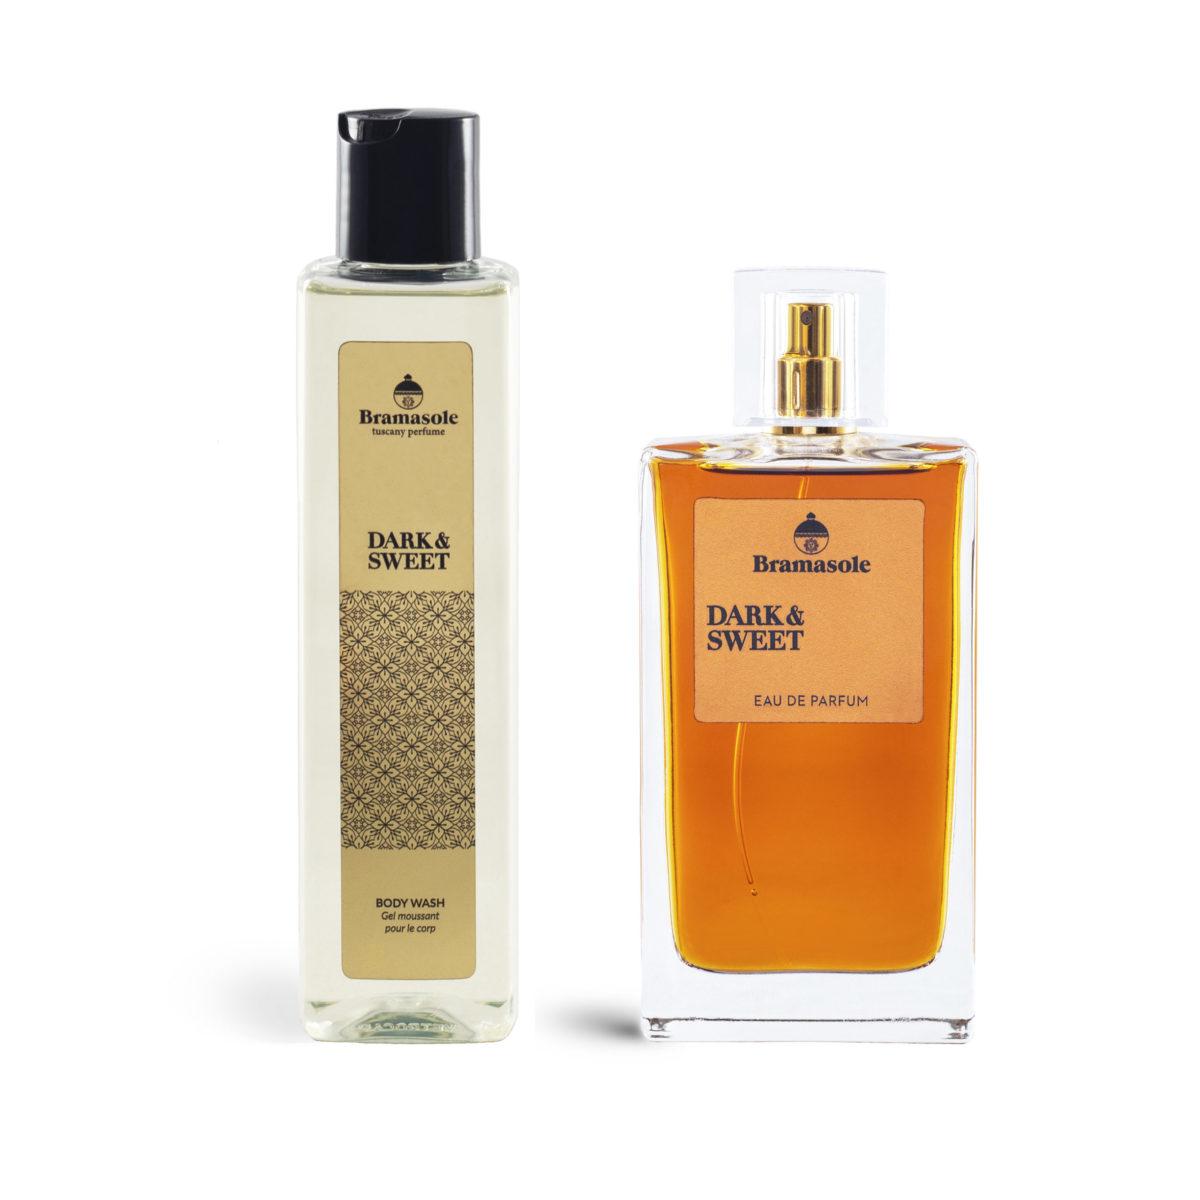 Jasmine Bride Perfume and Body